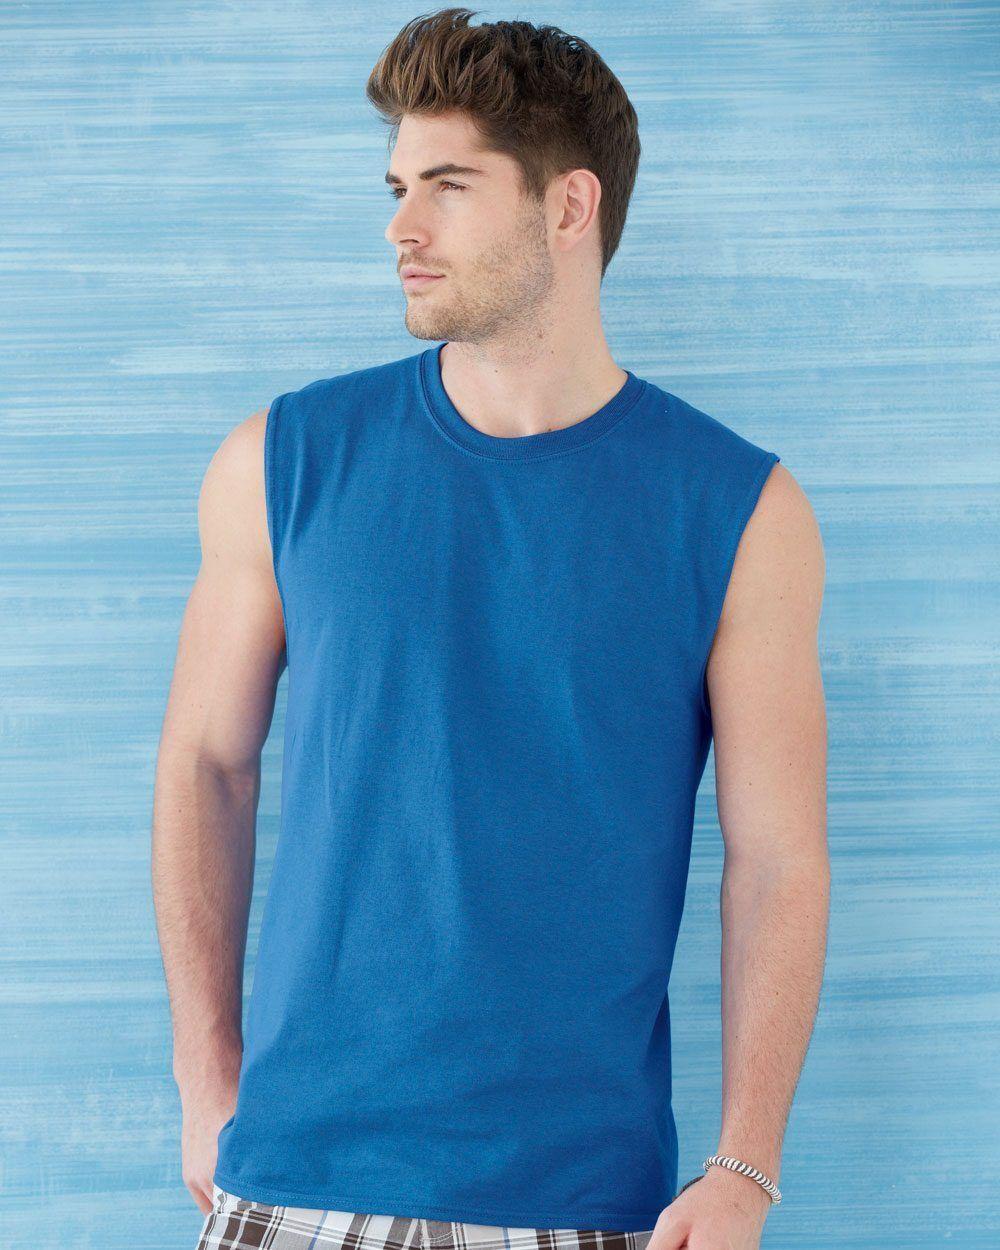 25 Blank Gildan Ultra Cotton Sleeveless T-Shirt Bulk Lot ok to mix S-XL & colors